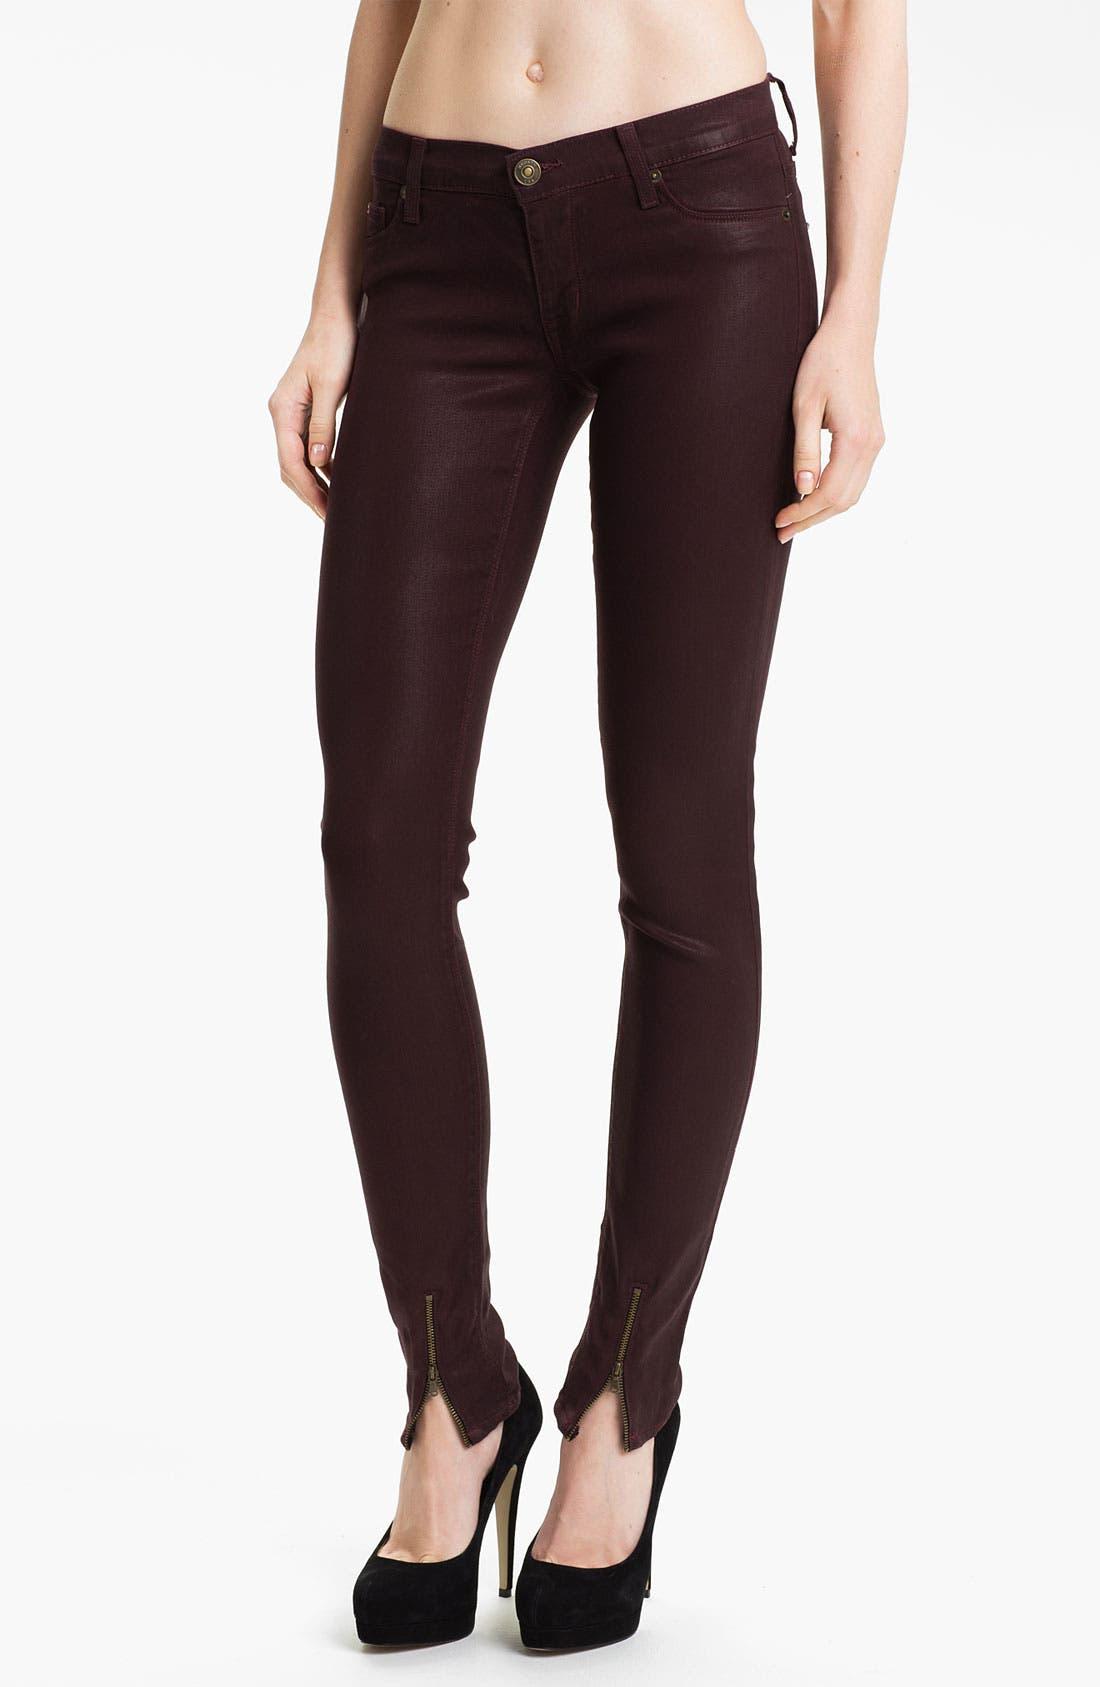 Main Image - Hudson Jeans Super Skinny Jeans (Bordeaux Wax)